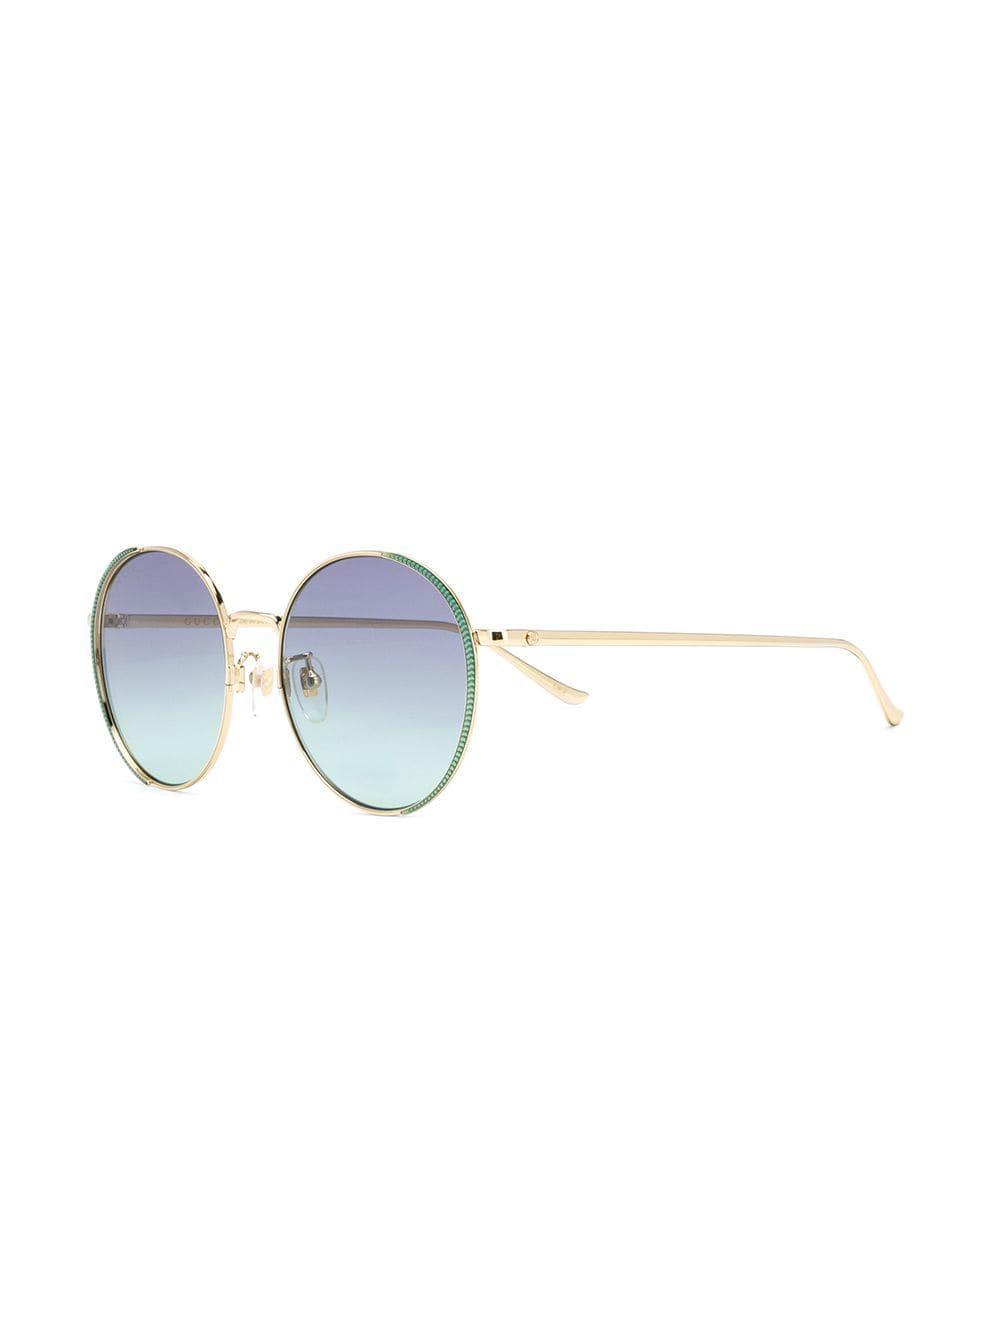 68148a1748b Gucci - Metallic Oversized Round Frame Sunglasses - Lyst. View fullscreen